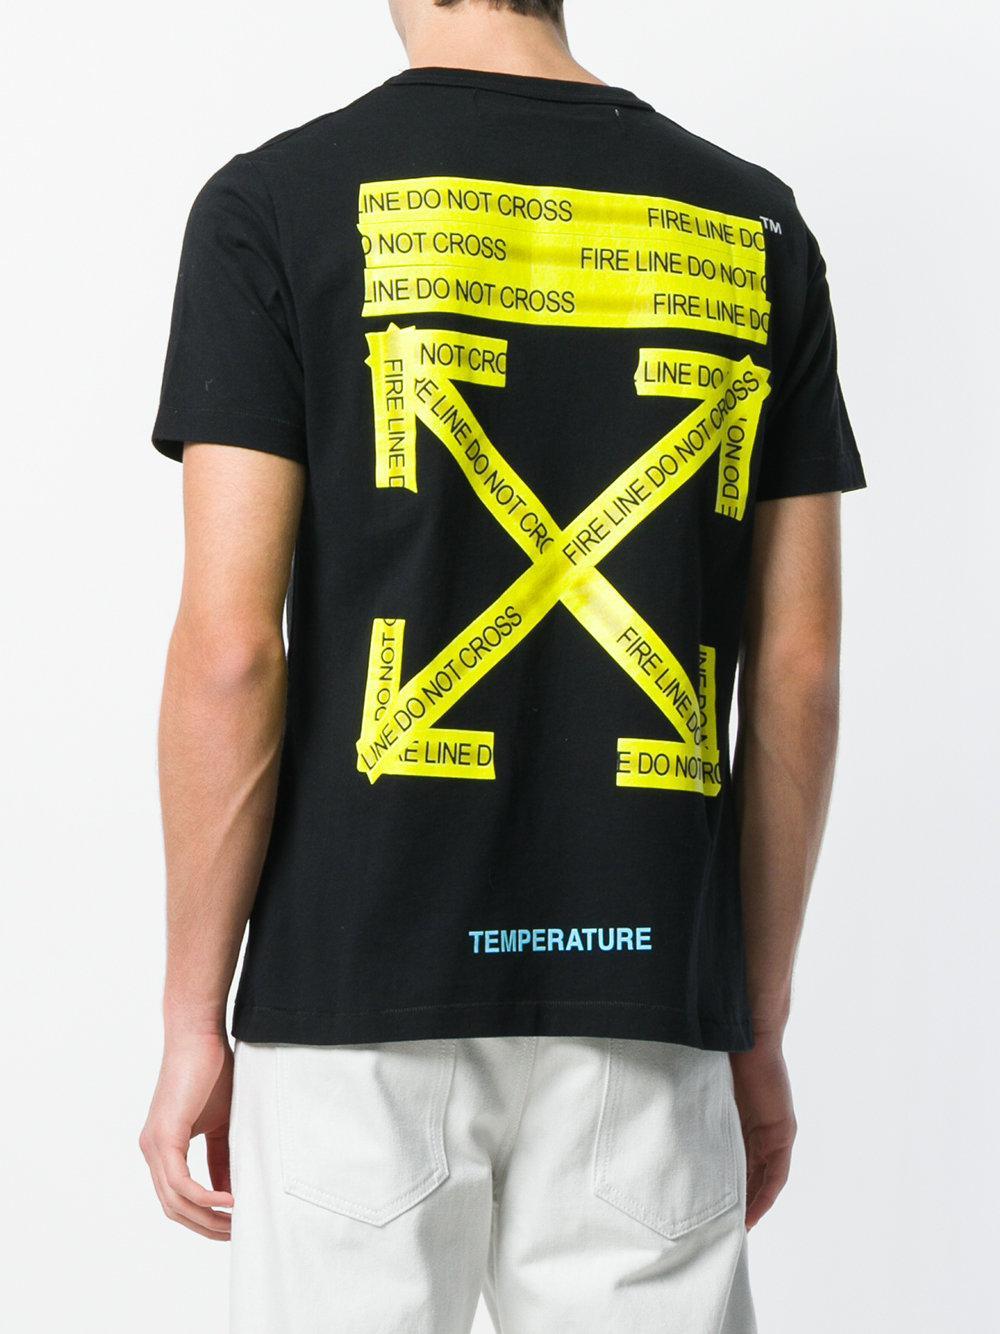 1916bc42d3ac Off-White c/o Virgil Abloh Caution Tape T-shirt in Black for Men - Lyst